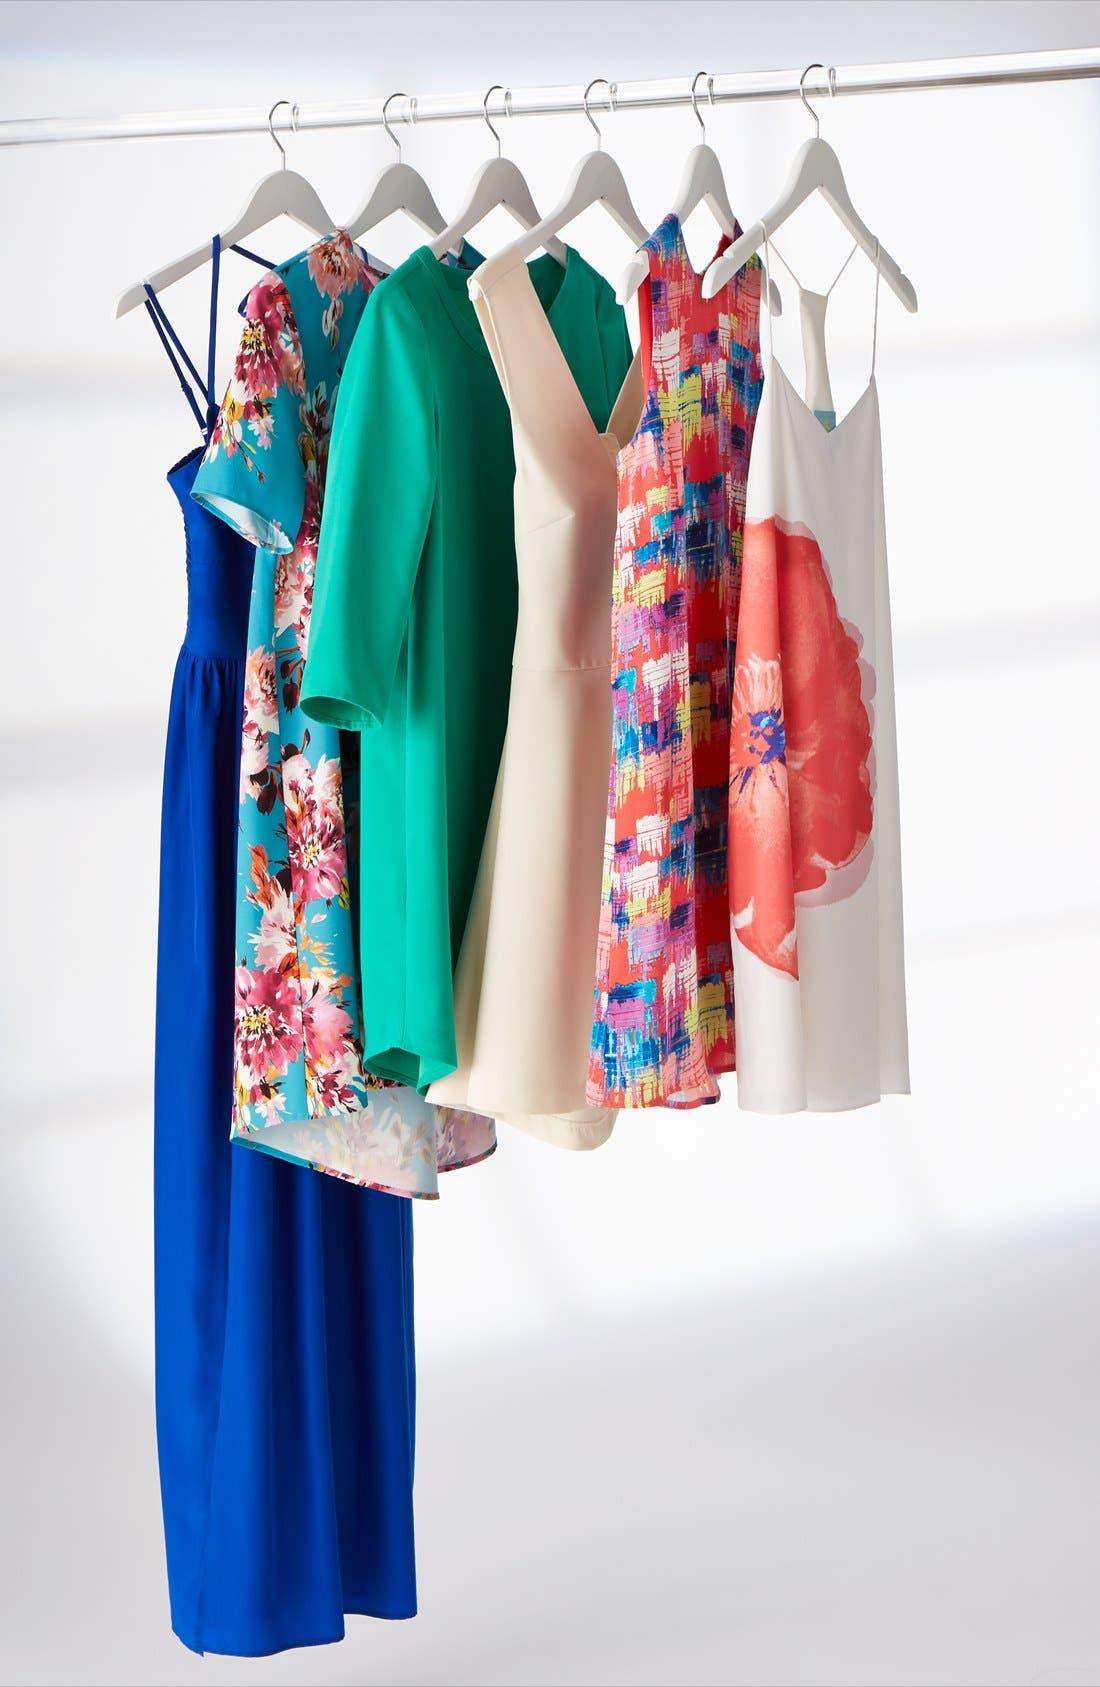 Bianca Back Cutout Fit & Flare Dress,                             Alternate thumbnail 12, color,                             001